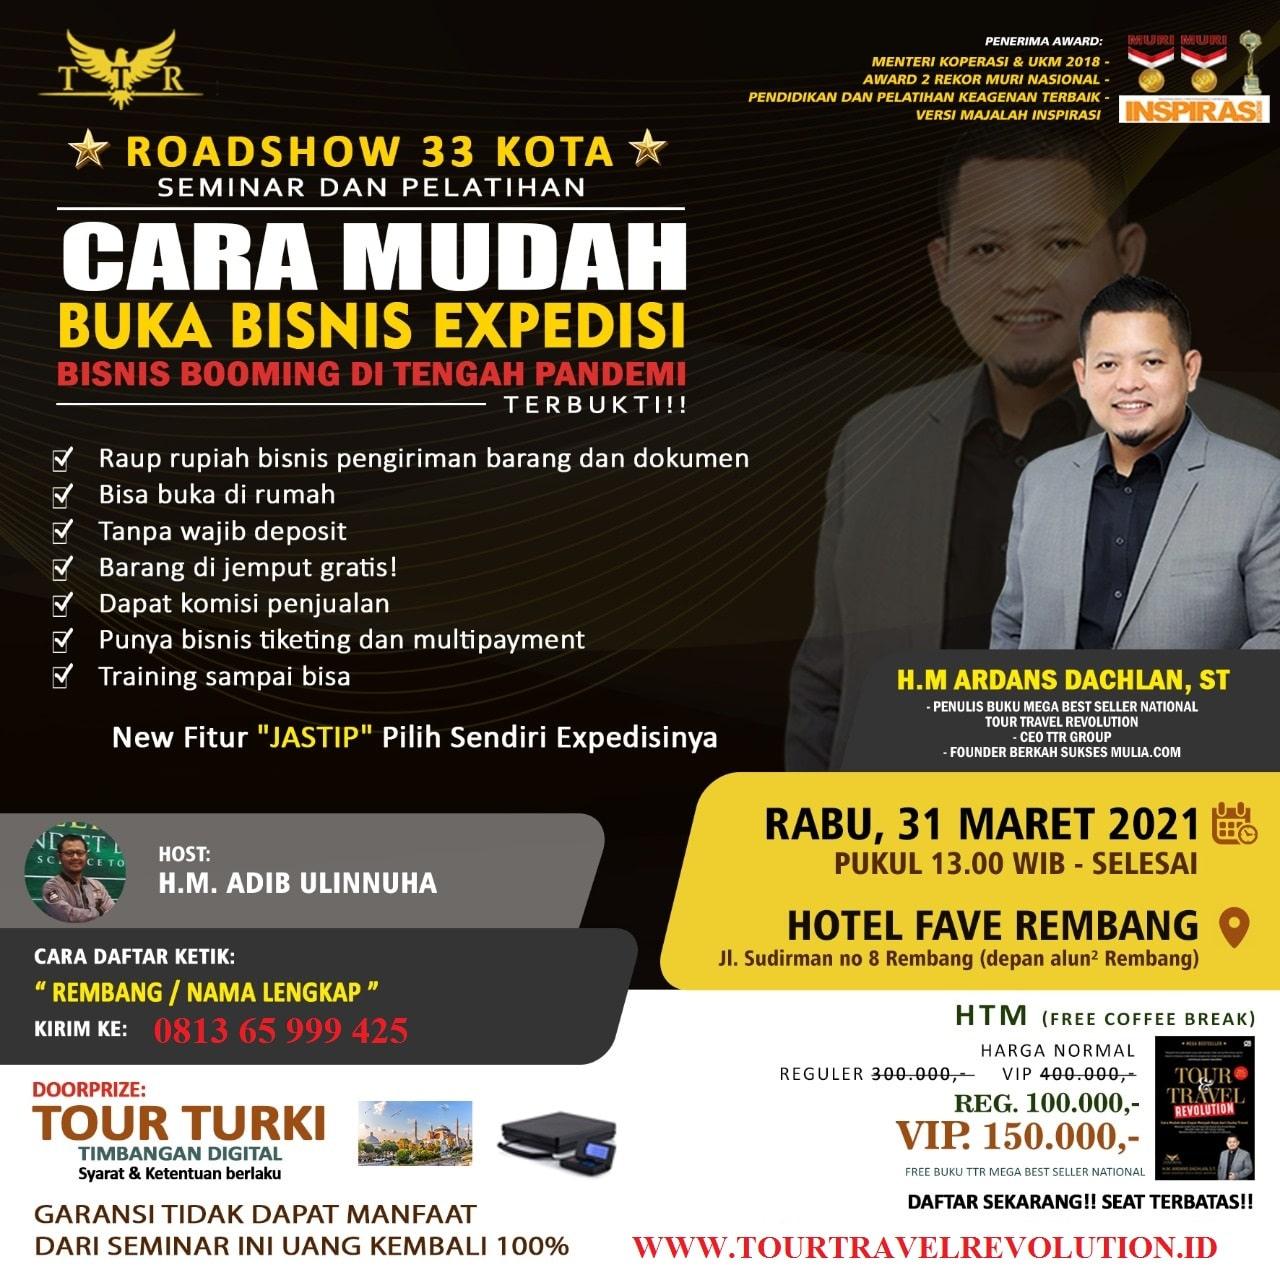 Seminar Multi Kurir Rembang